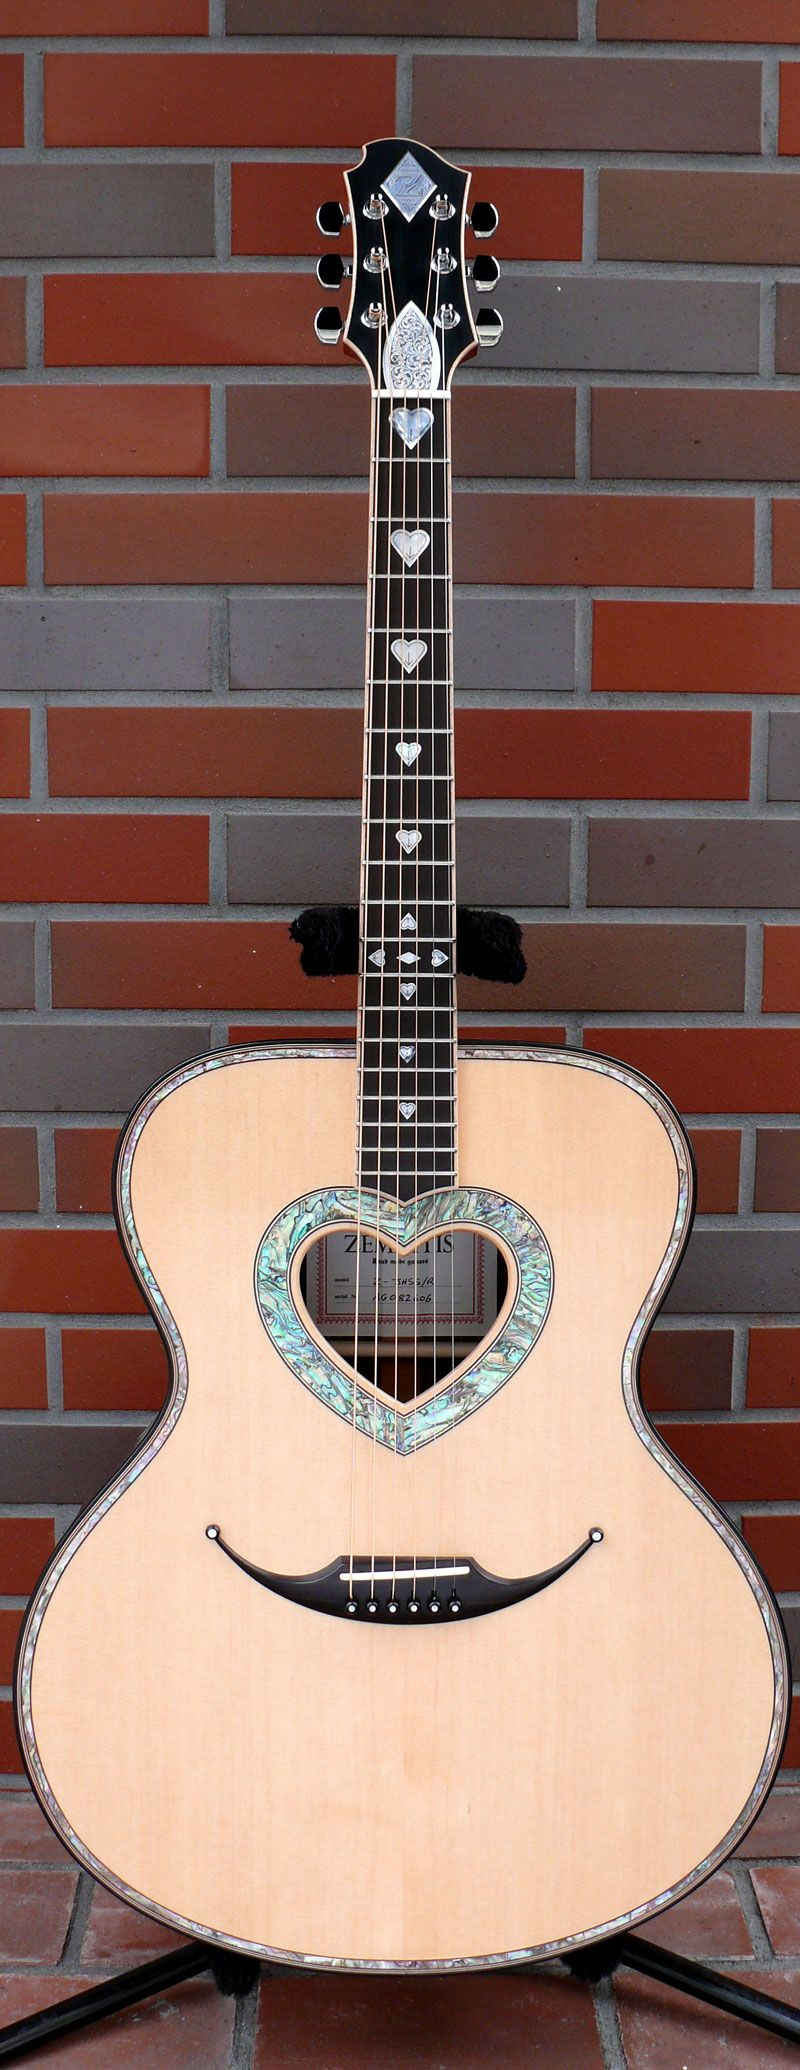 Zemaitis Guitars Zemaitis Acoustic Guitars Acoustic Guitar Guitar Guitar Inlay